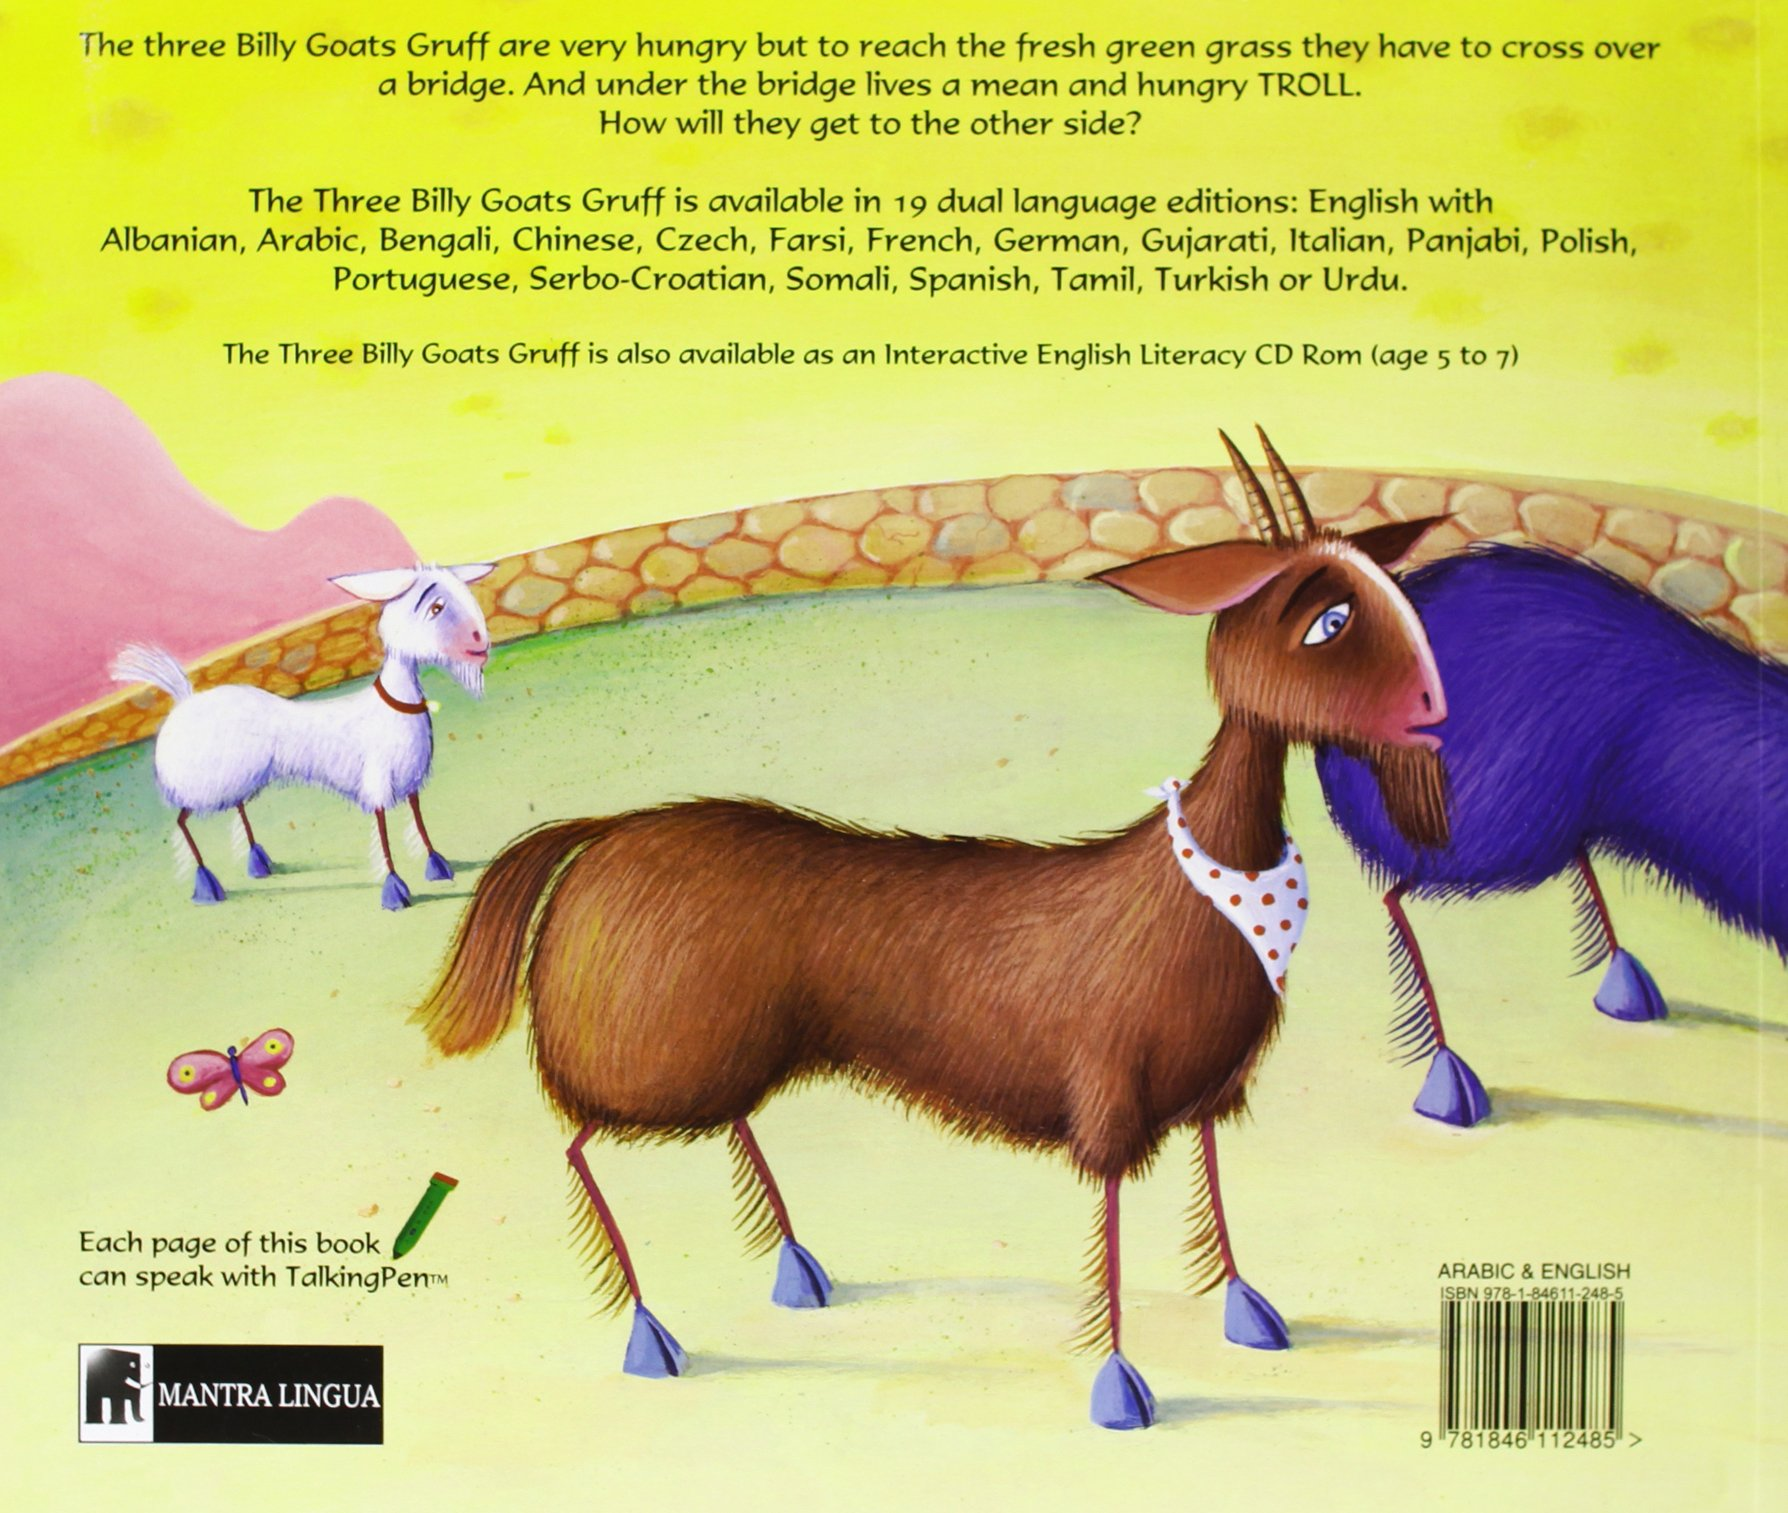 Mantra Lingua The Three Billy Goats Gruff, Arabic and